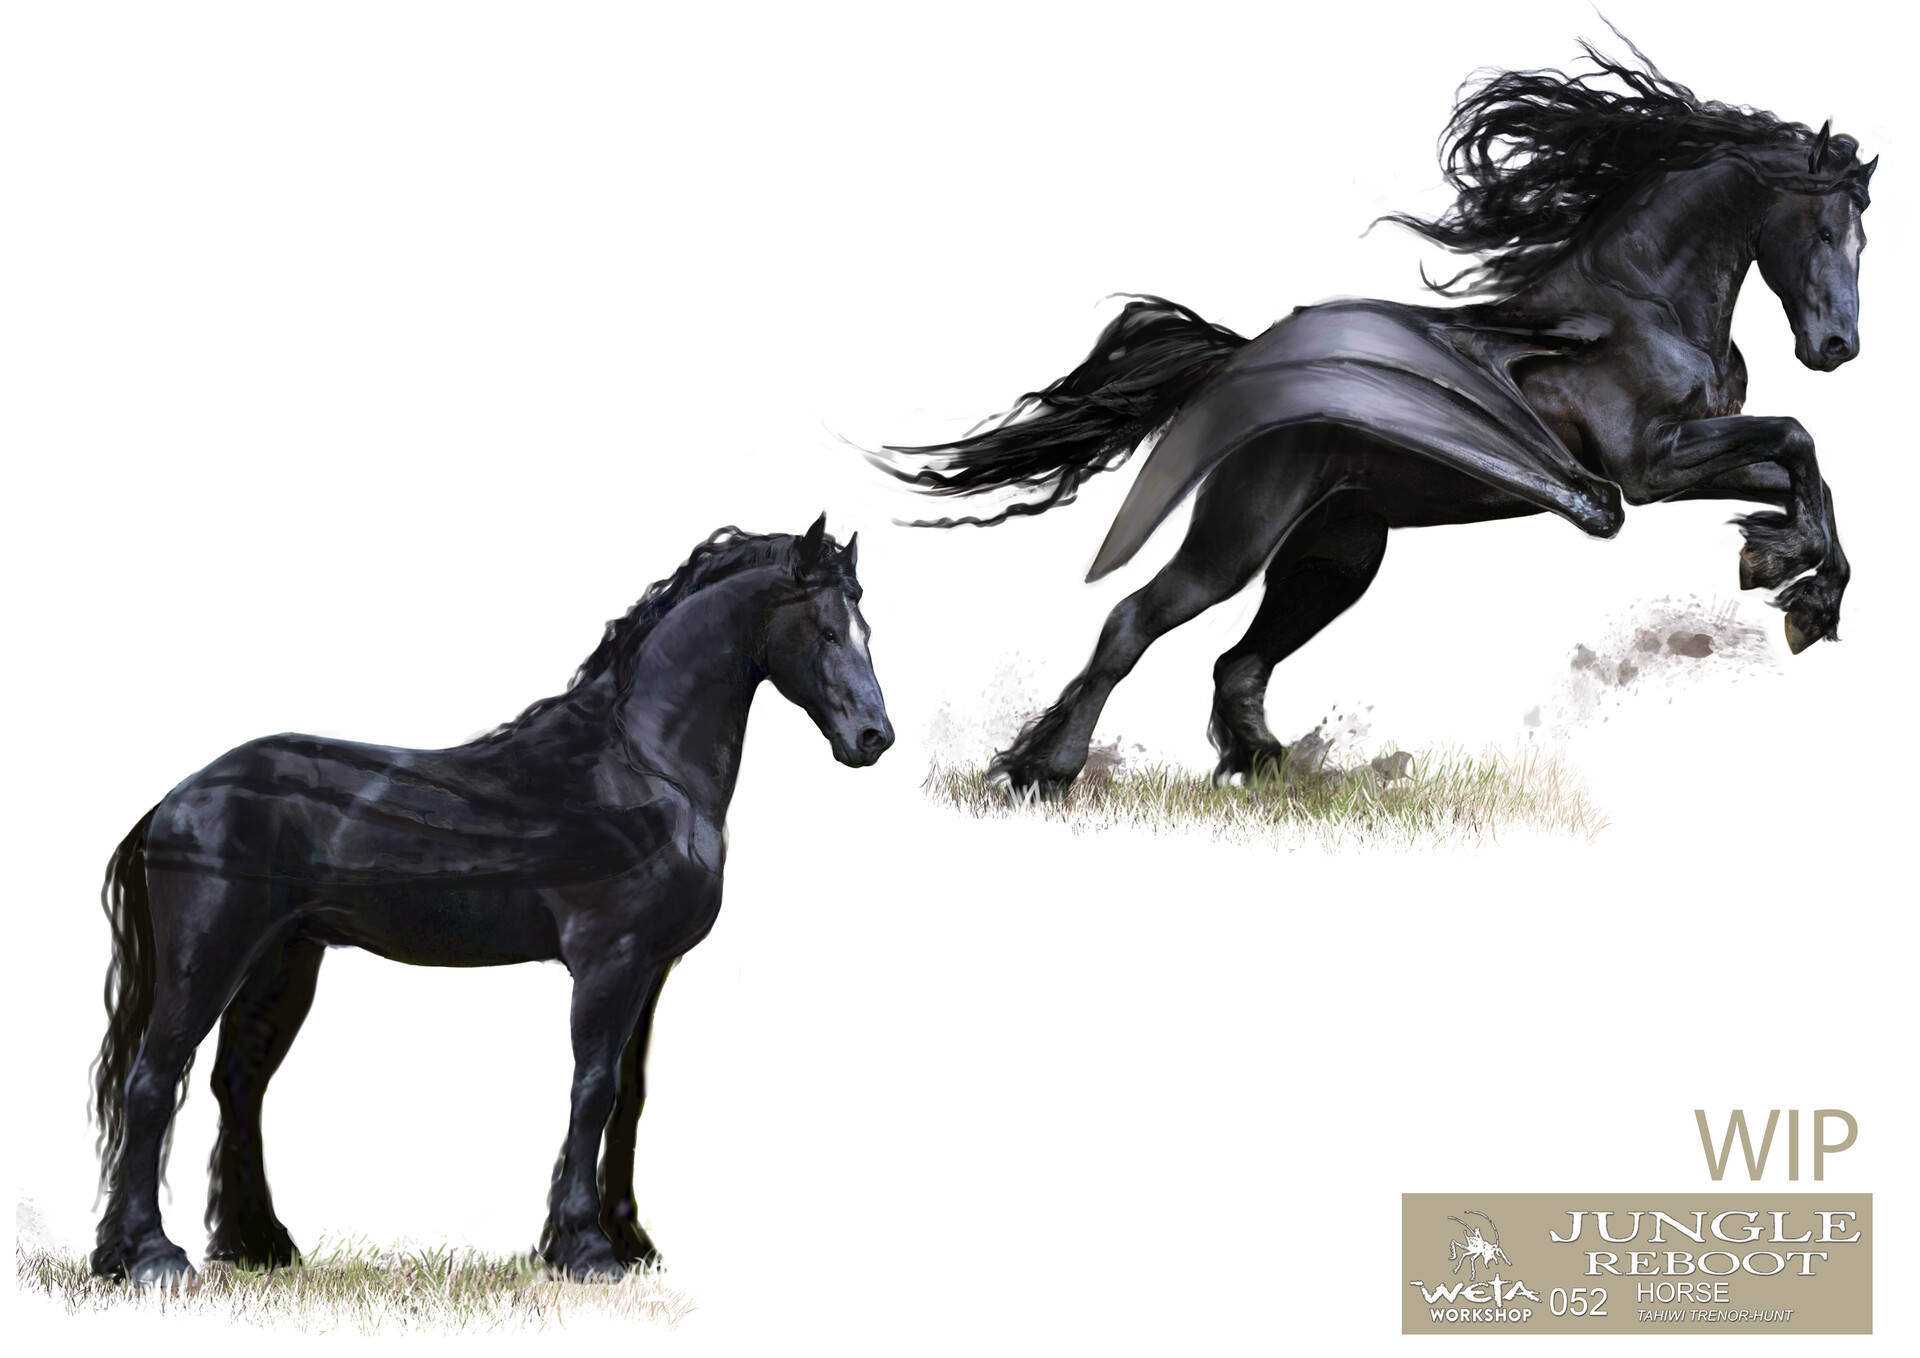 Weta workshop design studio 052 jr horse transformation 01 wip tth